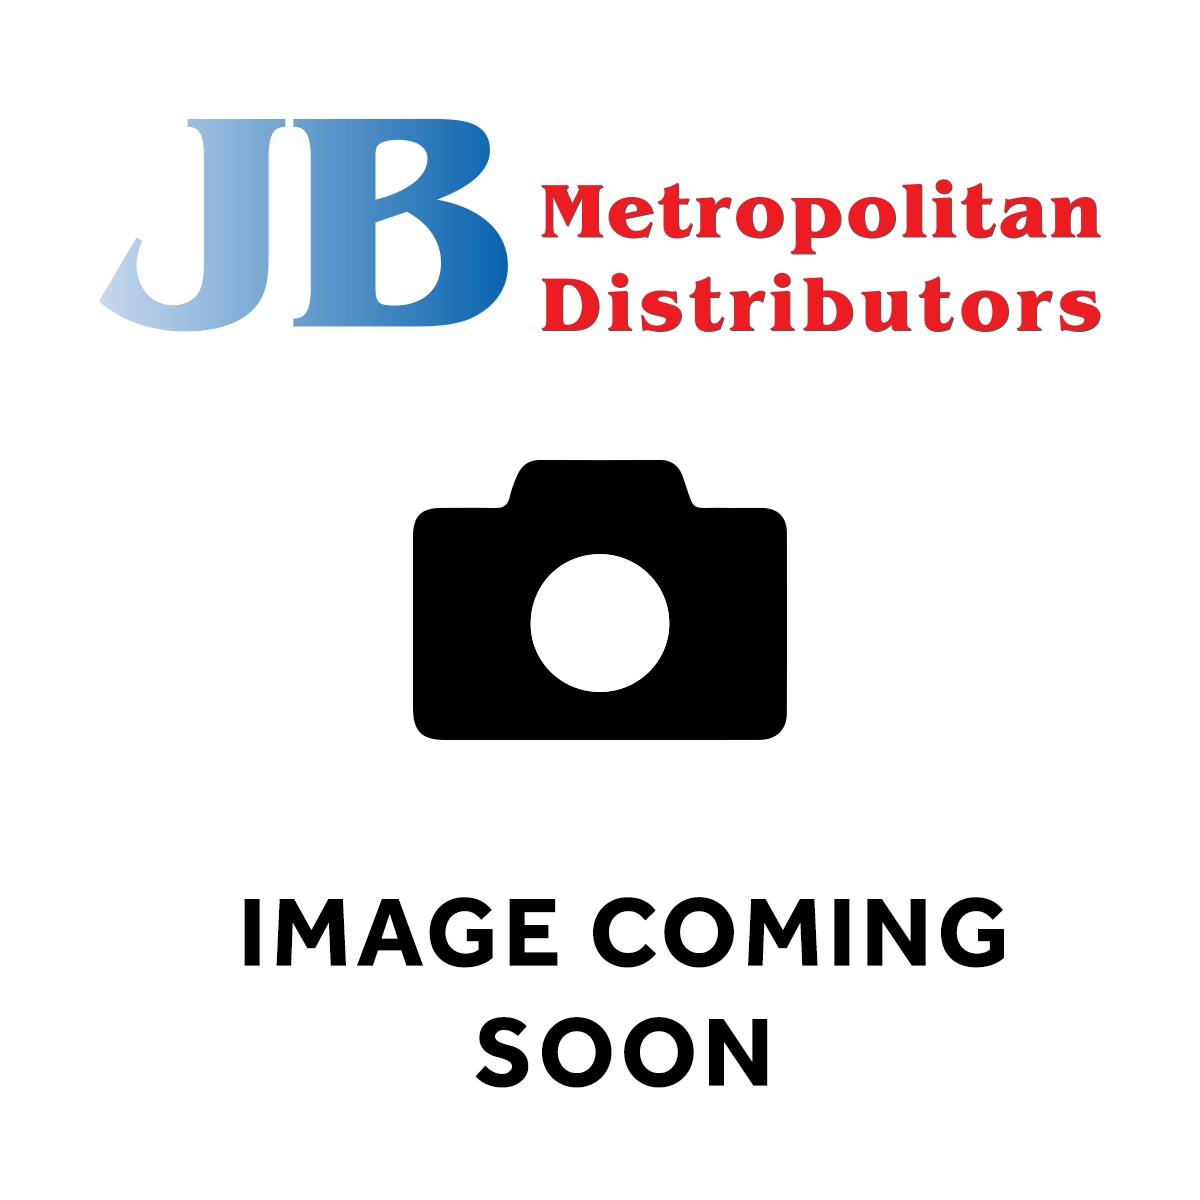 ARTLINE 500A WHITEBOARD BLACK